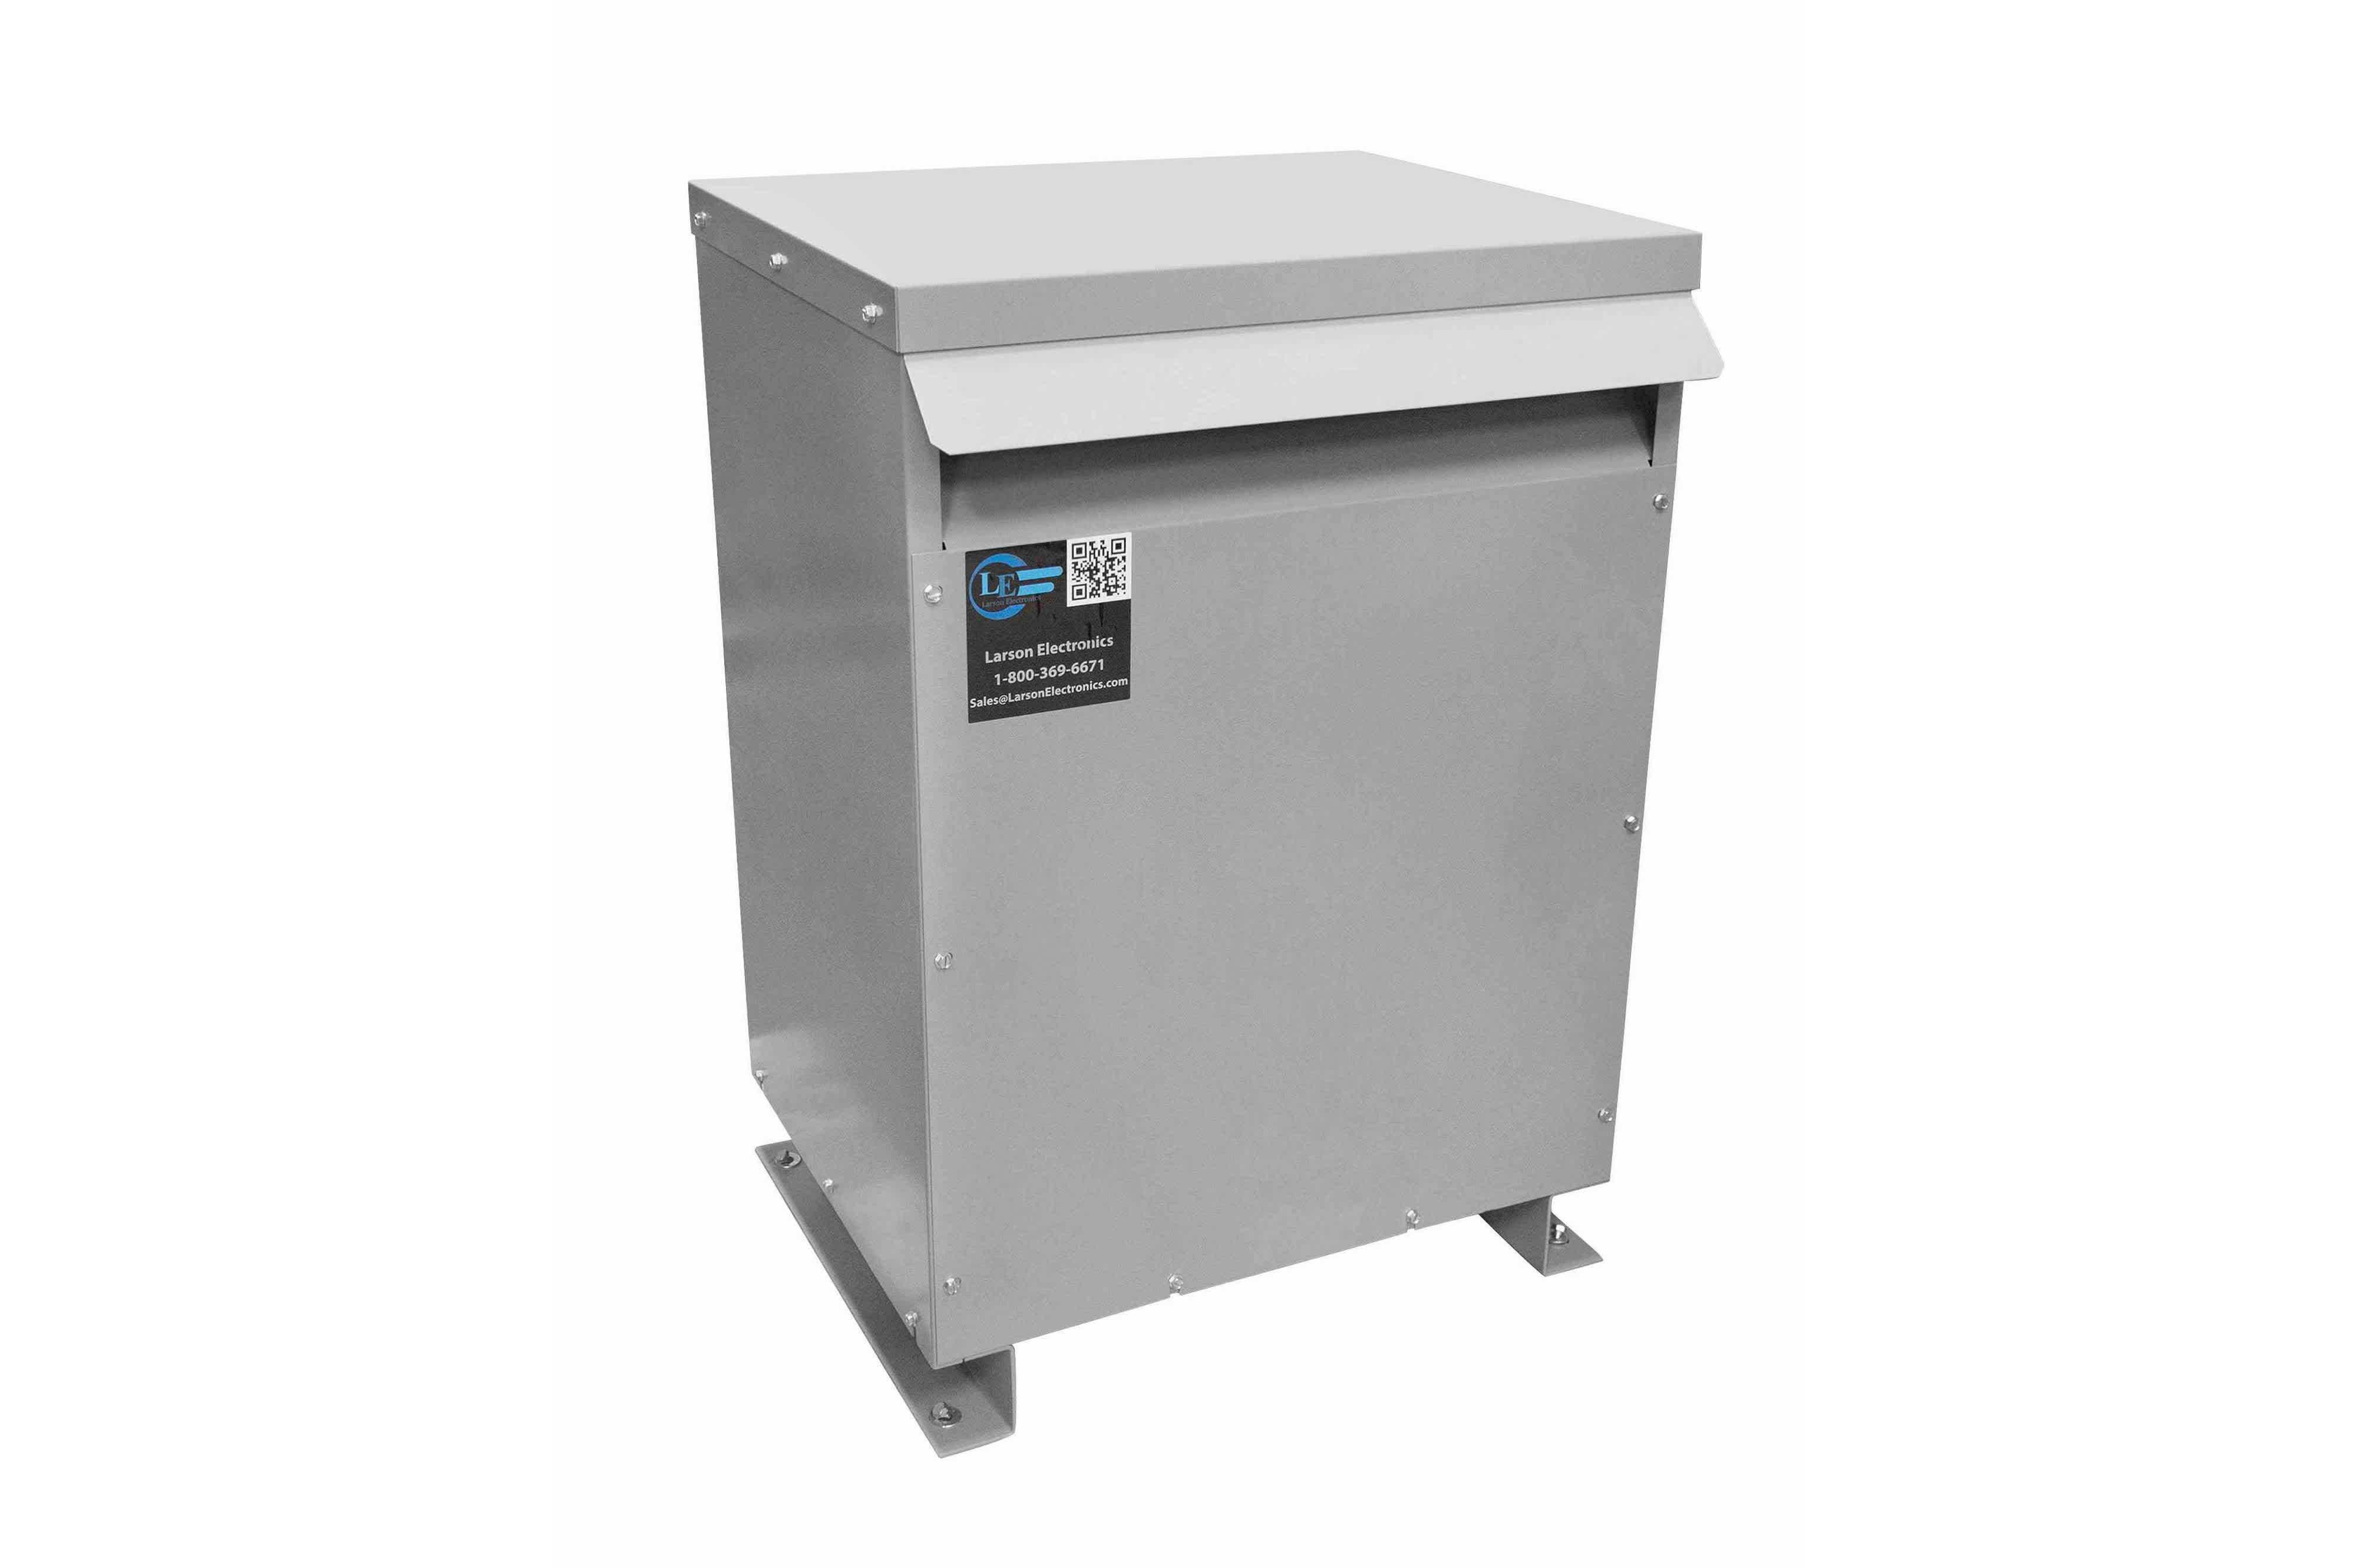 45 kVA 3PH Isolation Transformer, 460V Wye Primary, 380V Delta Secondary, N3R, Ventilated, 60 Hz